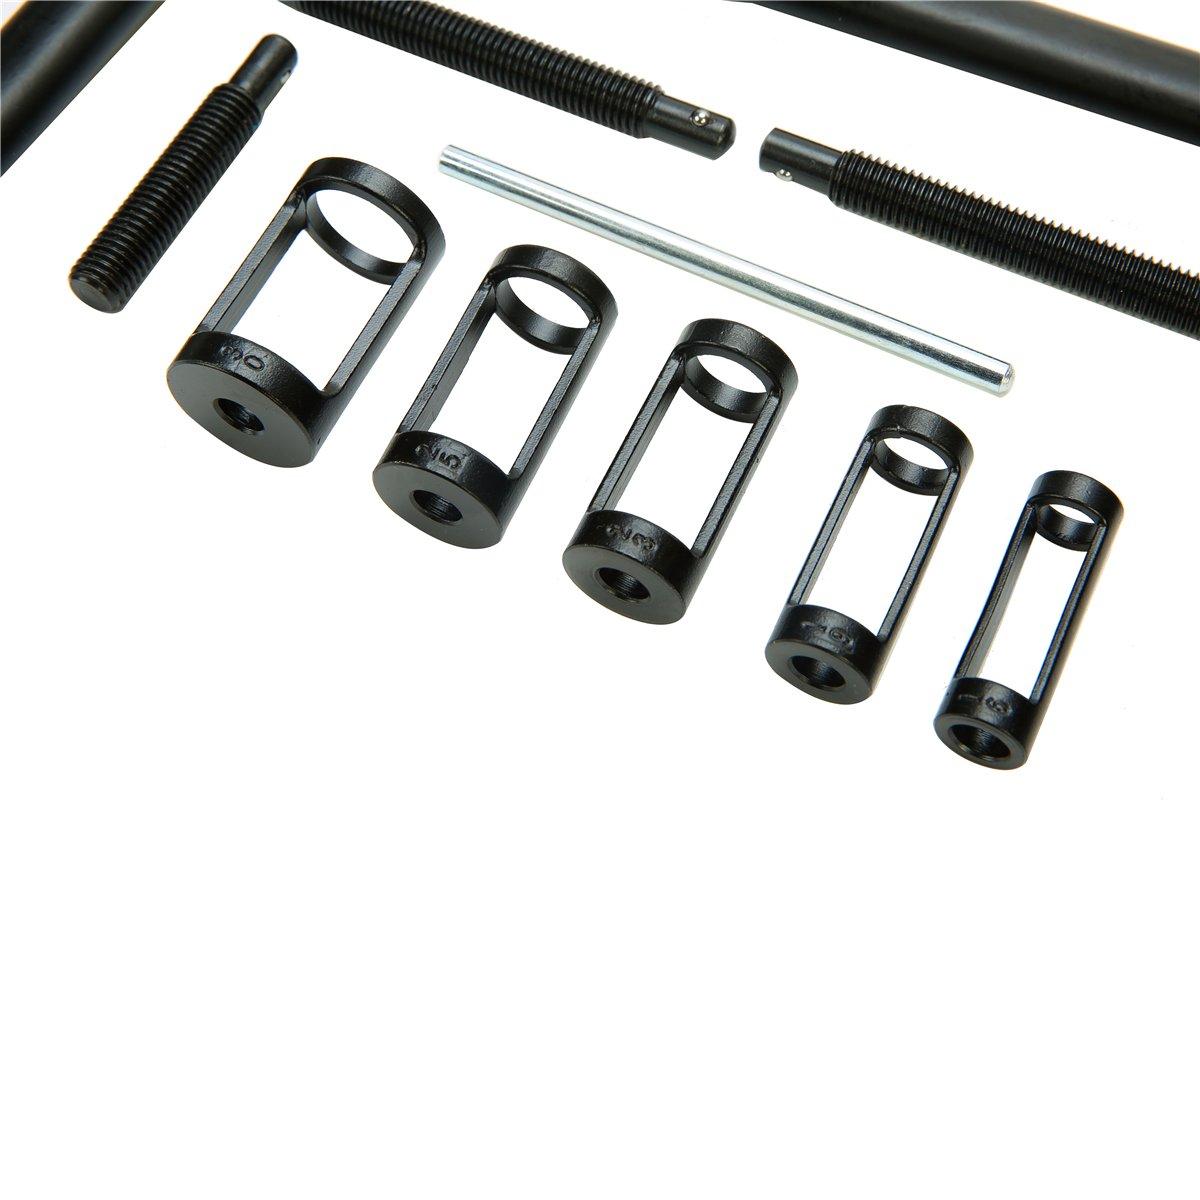 8milelake AUTO Solid Valve Spring Compressor Automotive Tool Set Repair Tool Kit by 8MILELAE (Image #3)